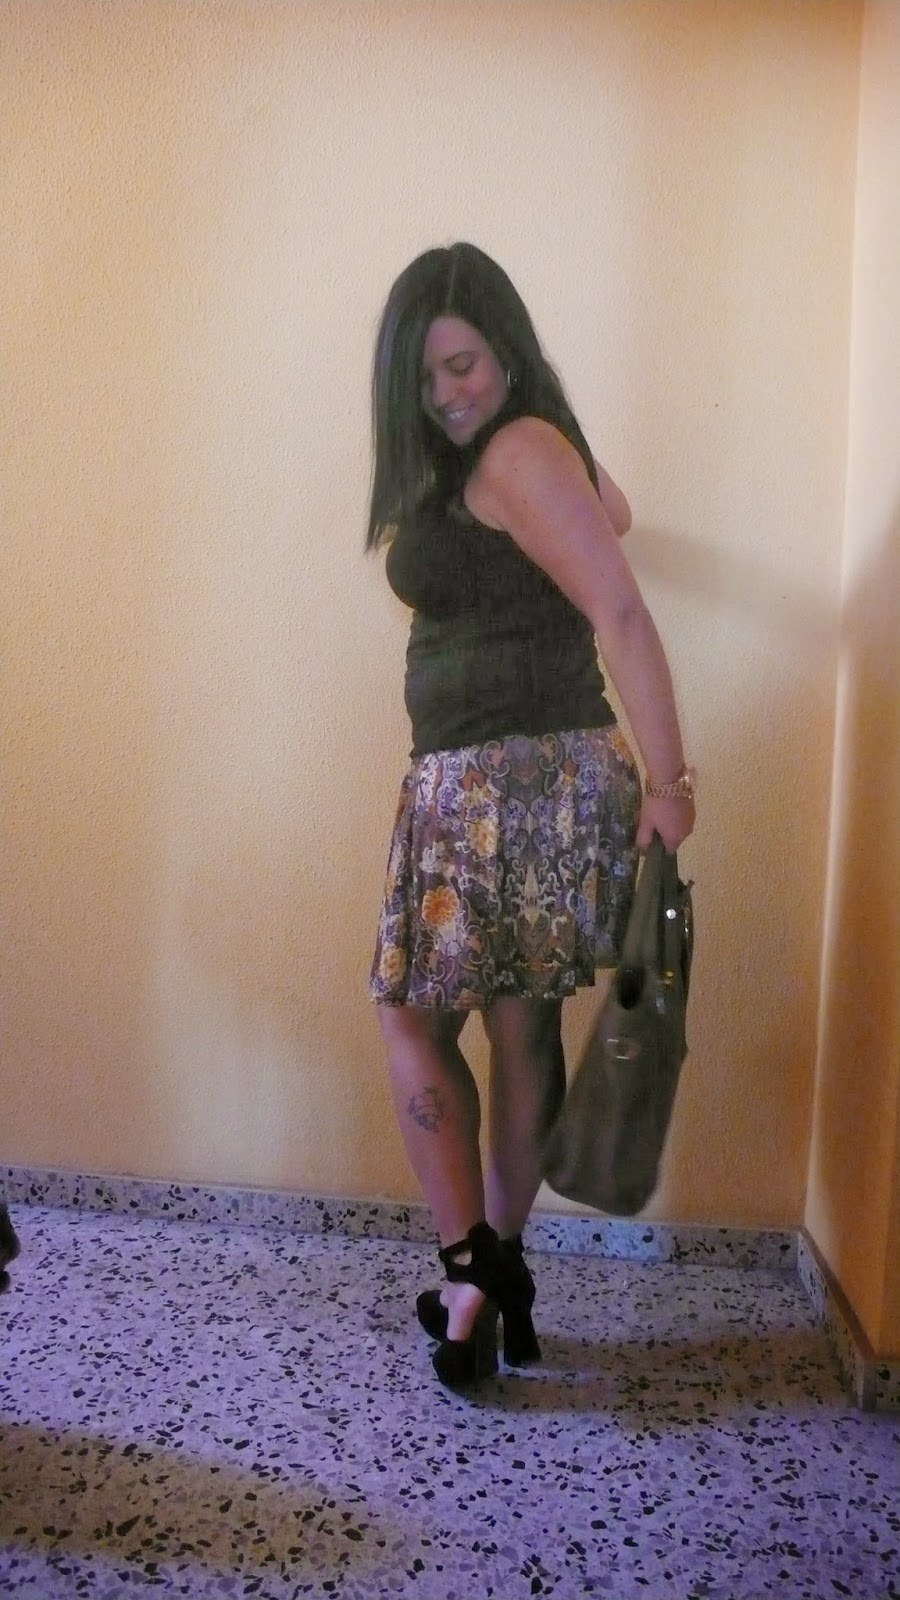 http://www.oasap.com/heels/37512-eye-catching-peep-toe-platforms.html?fuid=98518